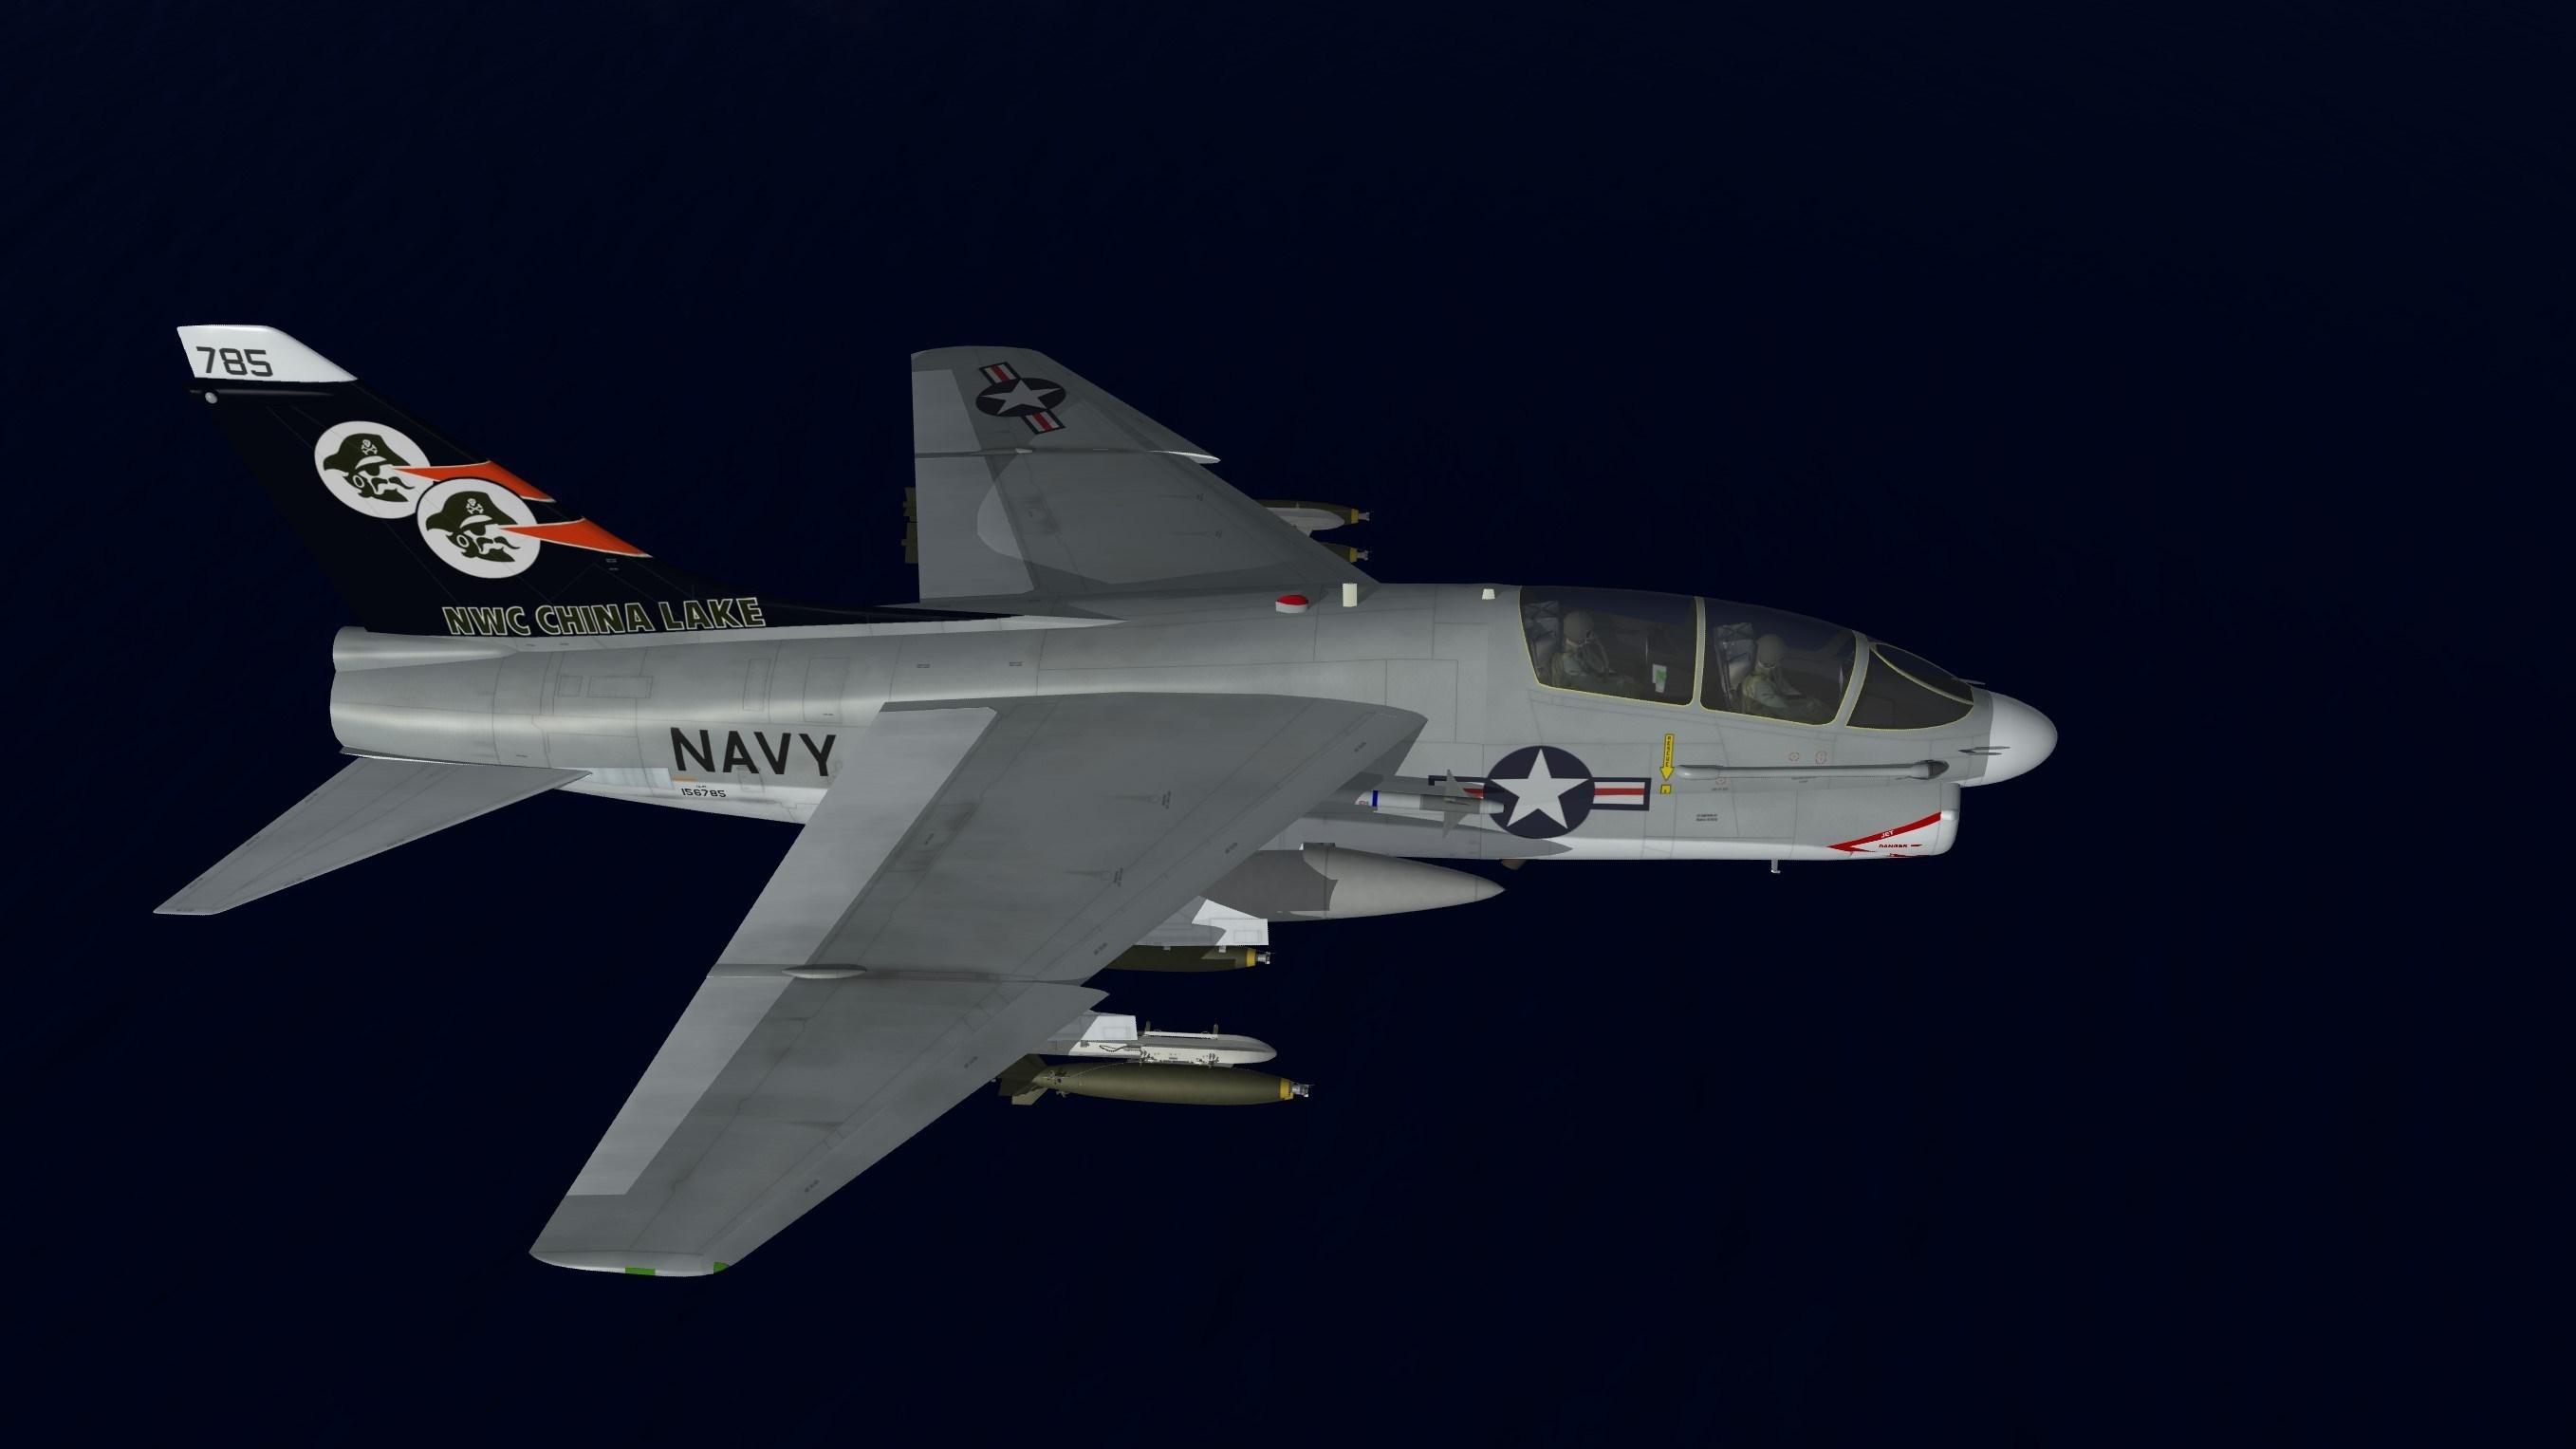 LTV TA-7C Corsair II - The Mirage Factory